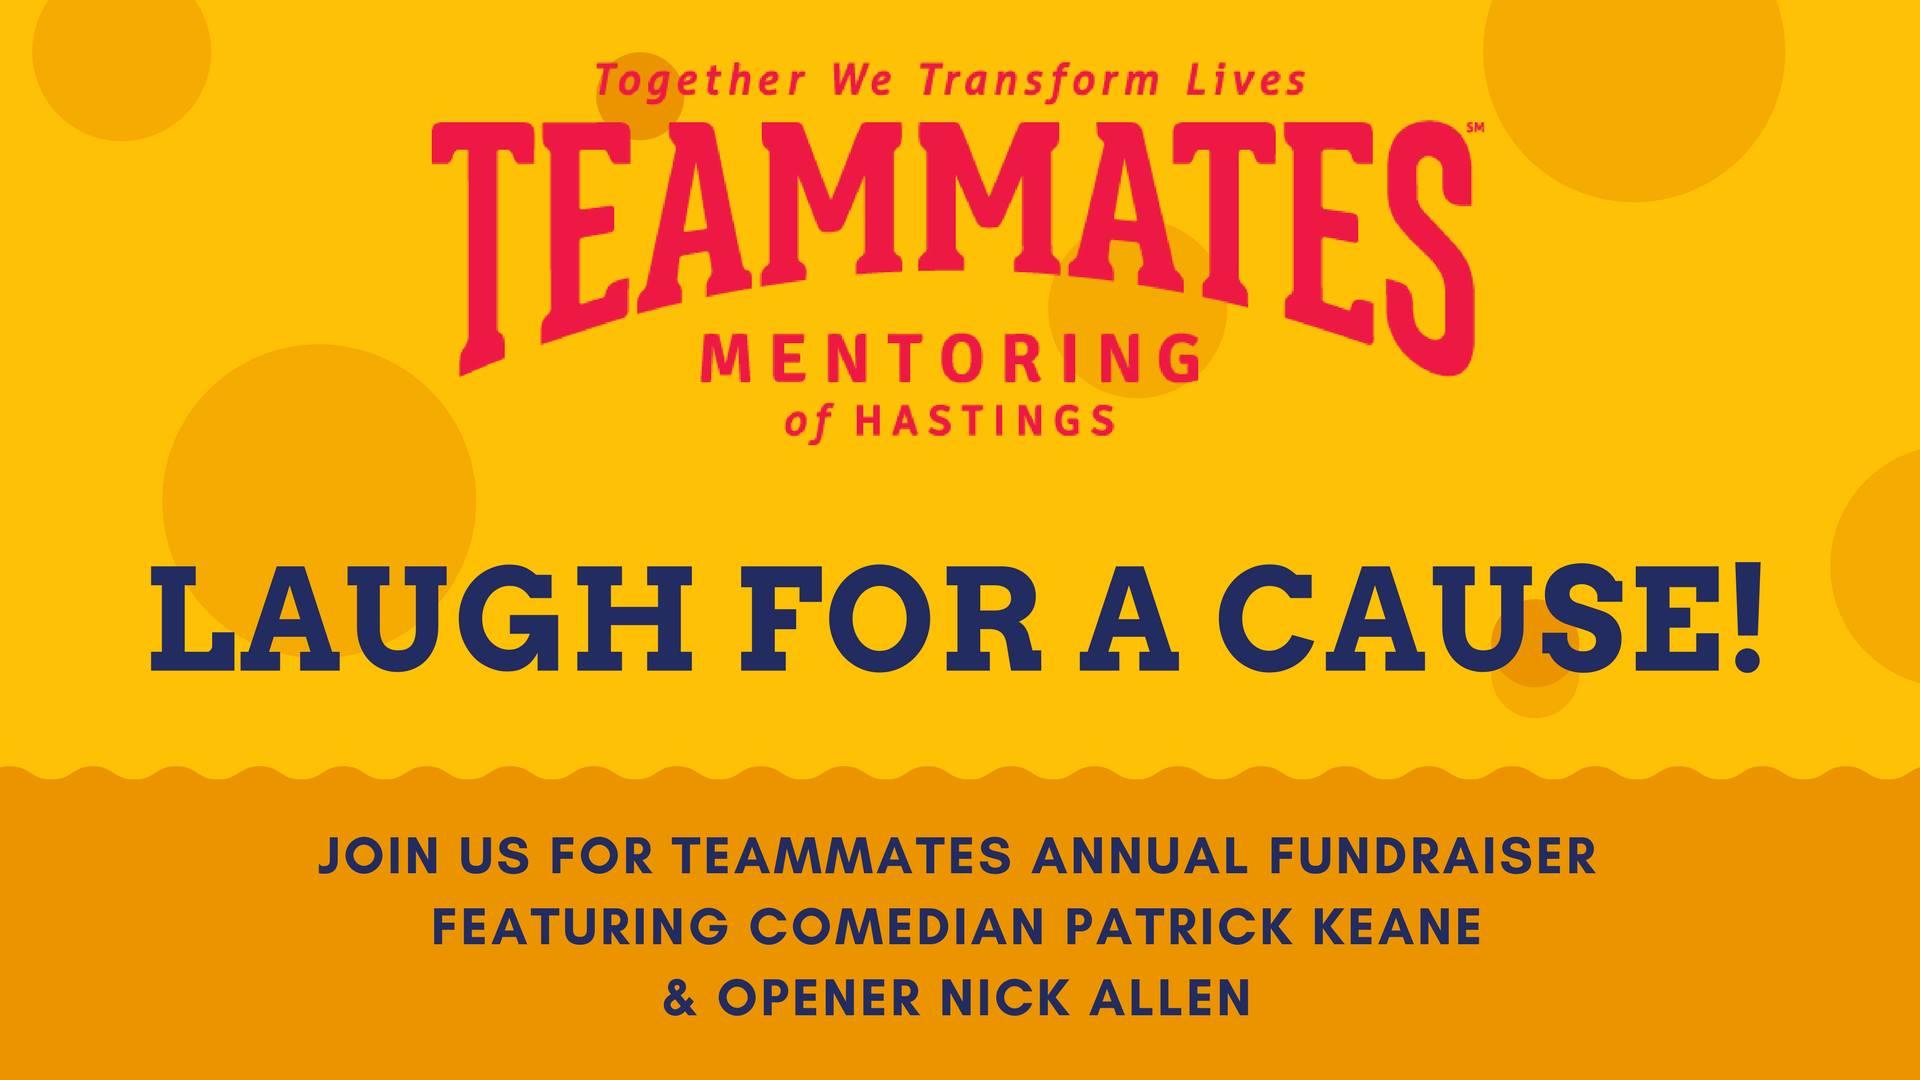 teammates_laugh_cause_fundraiser.jpg